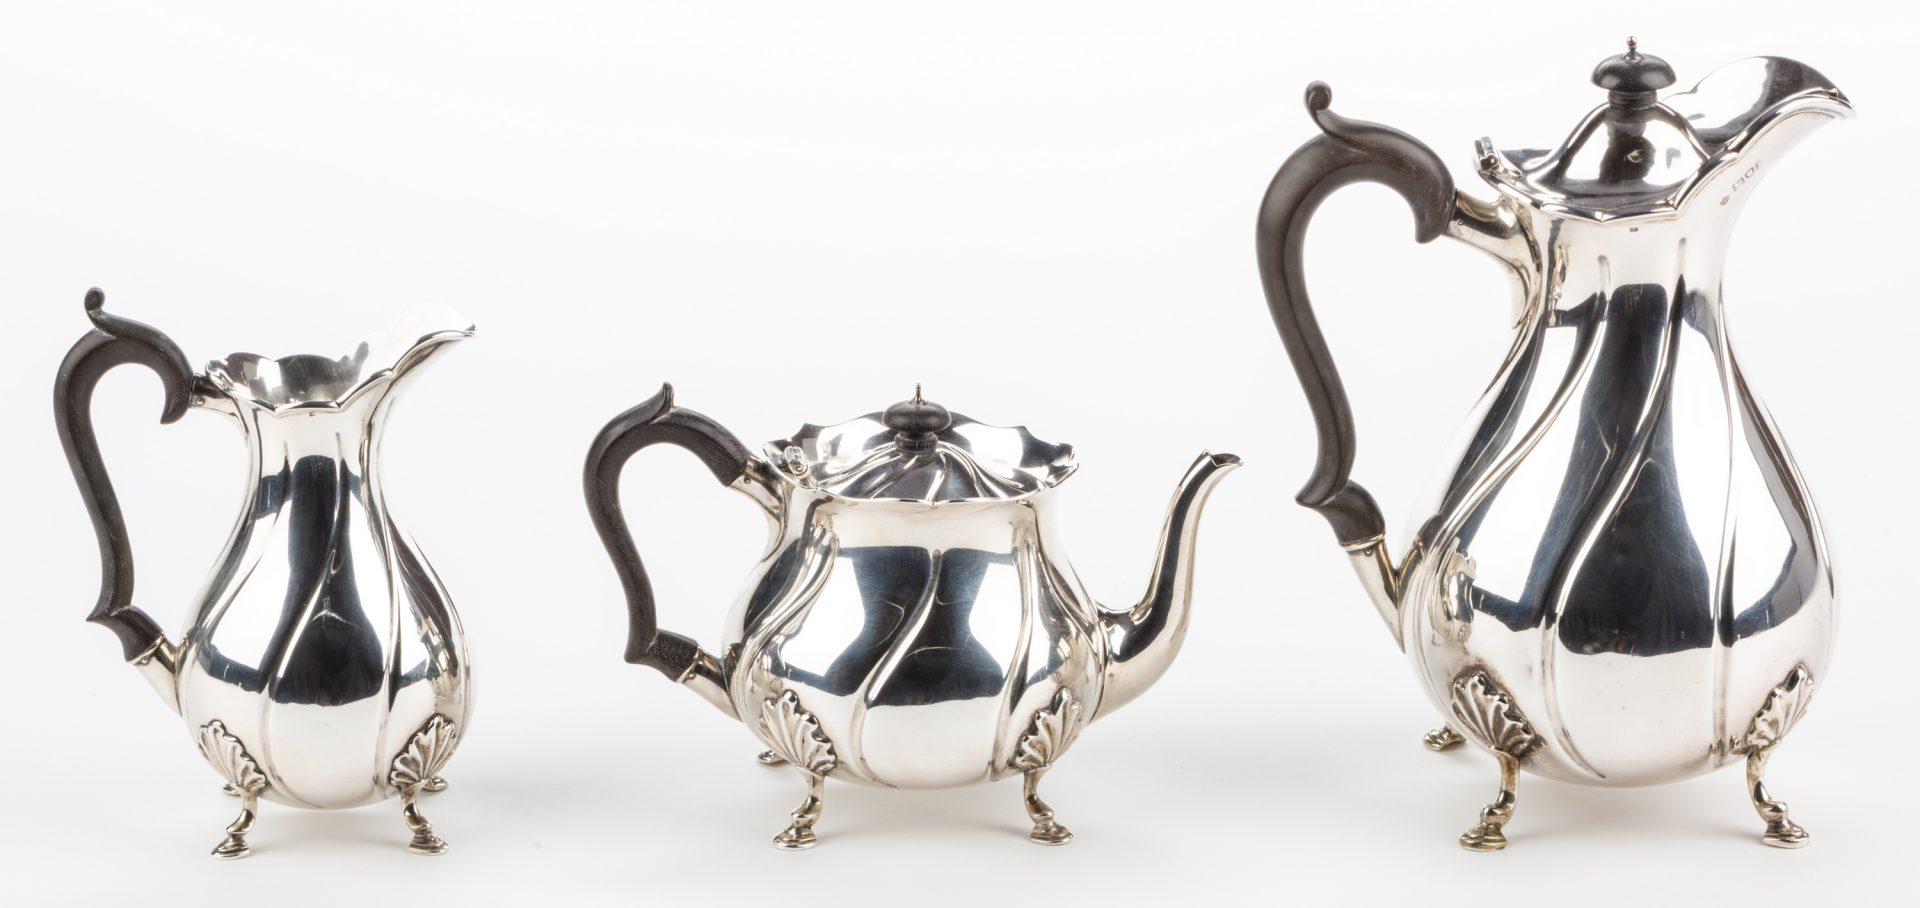 Lot 297: 6 pc. English Sterling Tea Set, plus more, 11 total pcs.